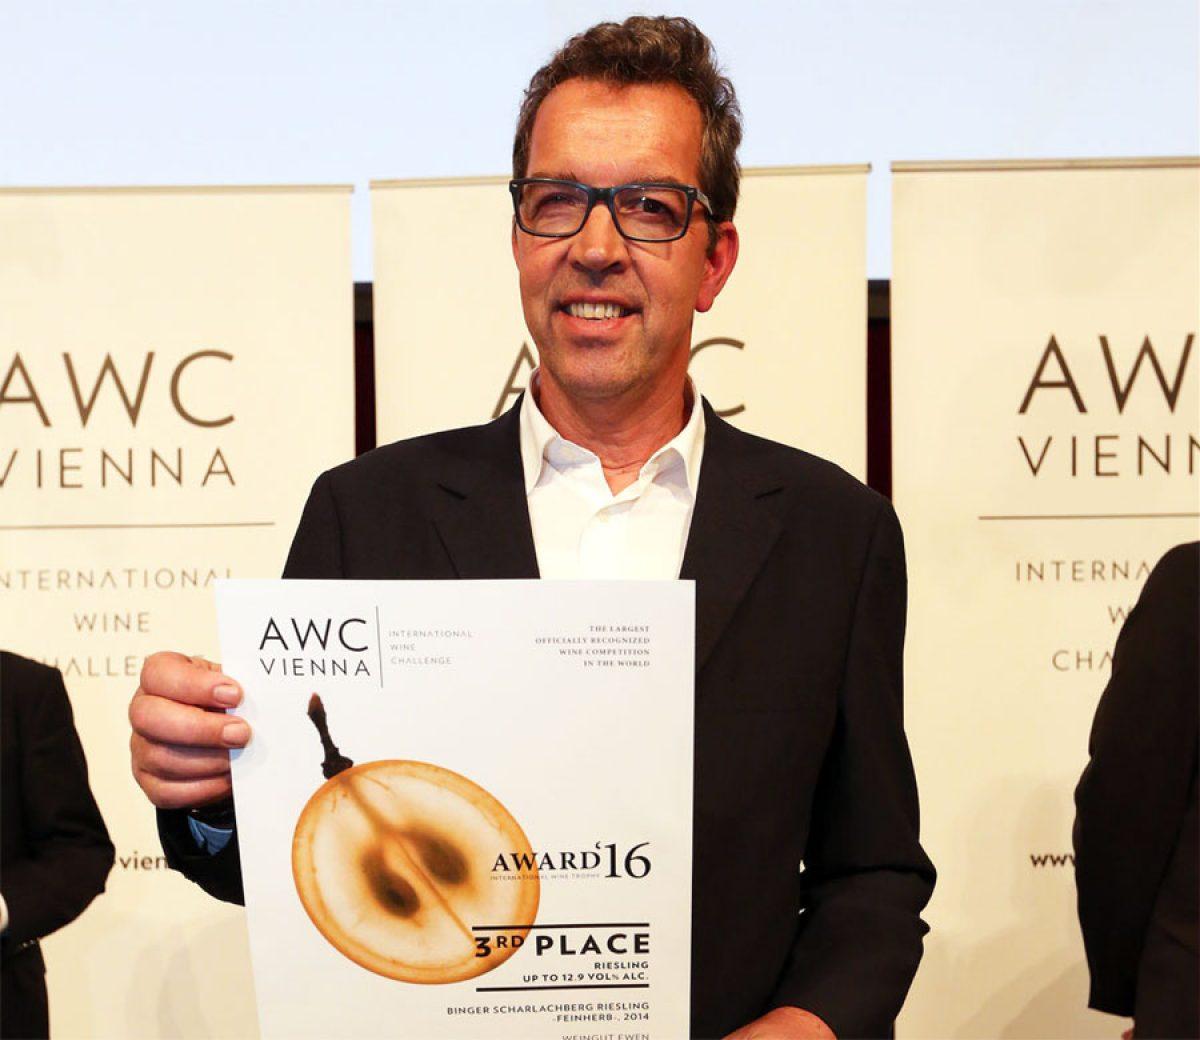 Peter_AWC_Vienna_2